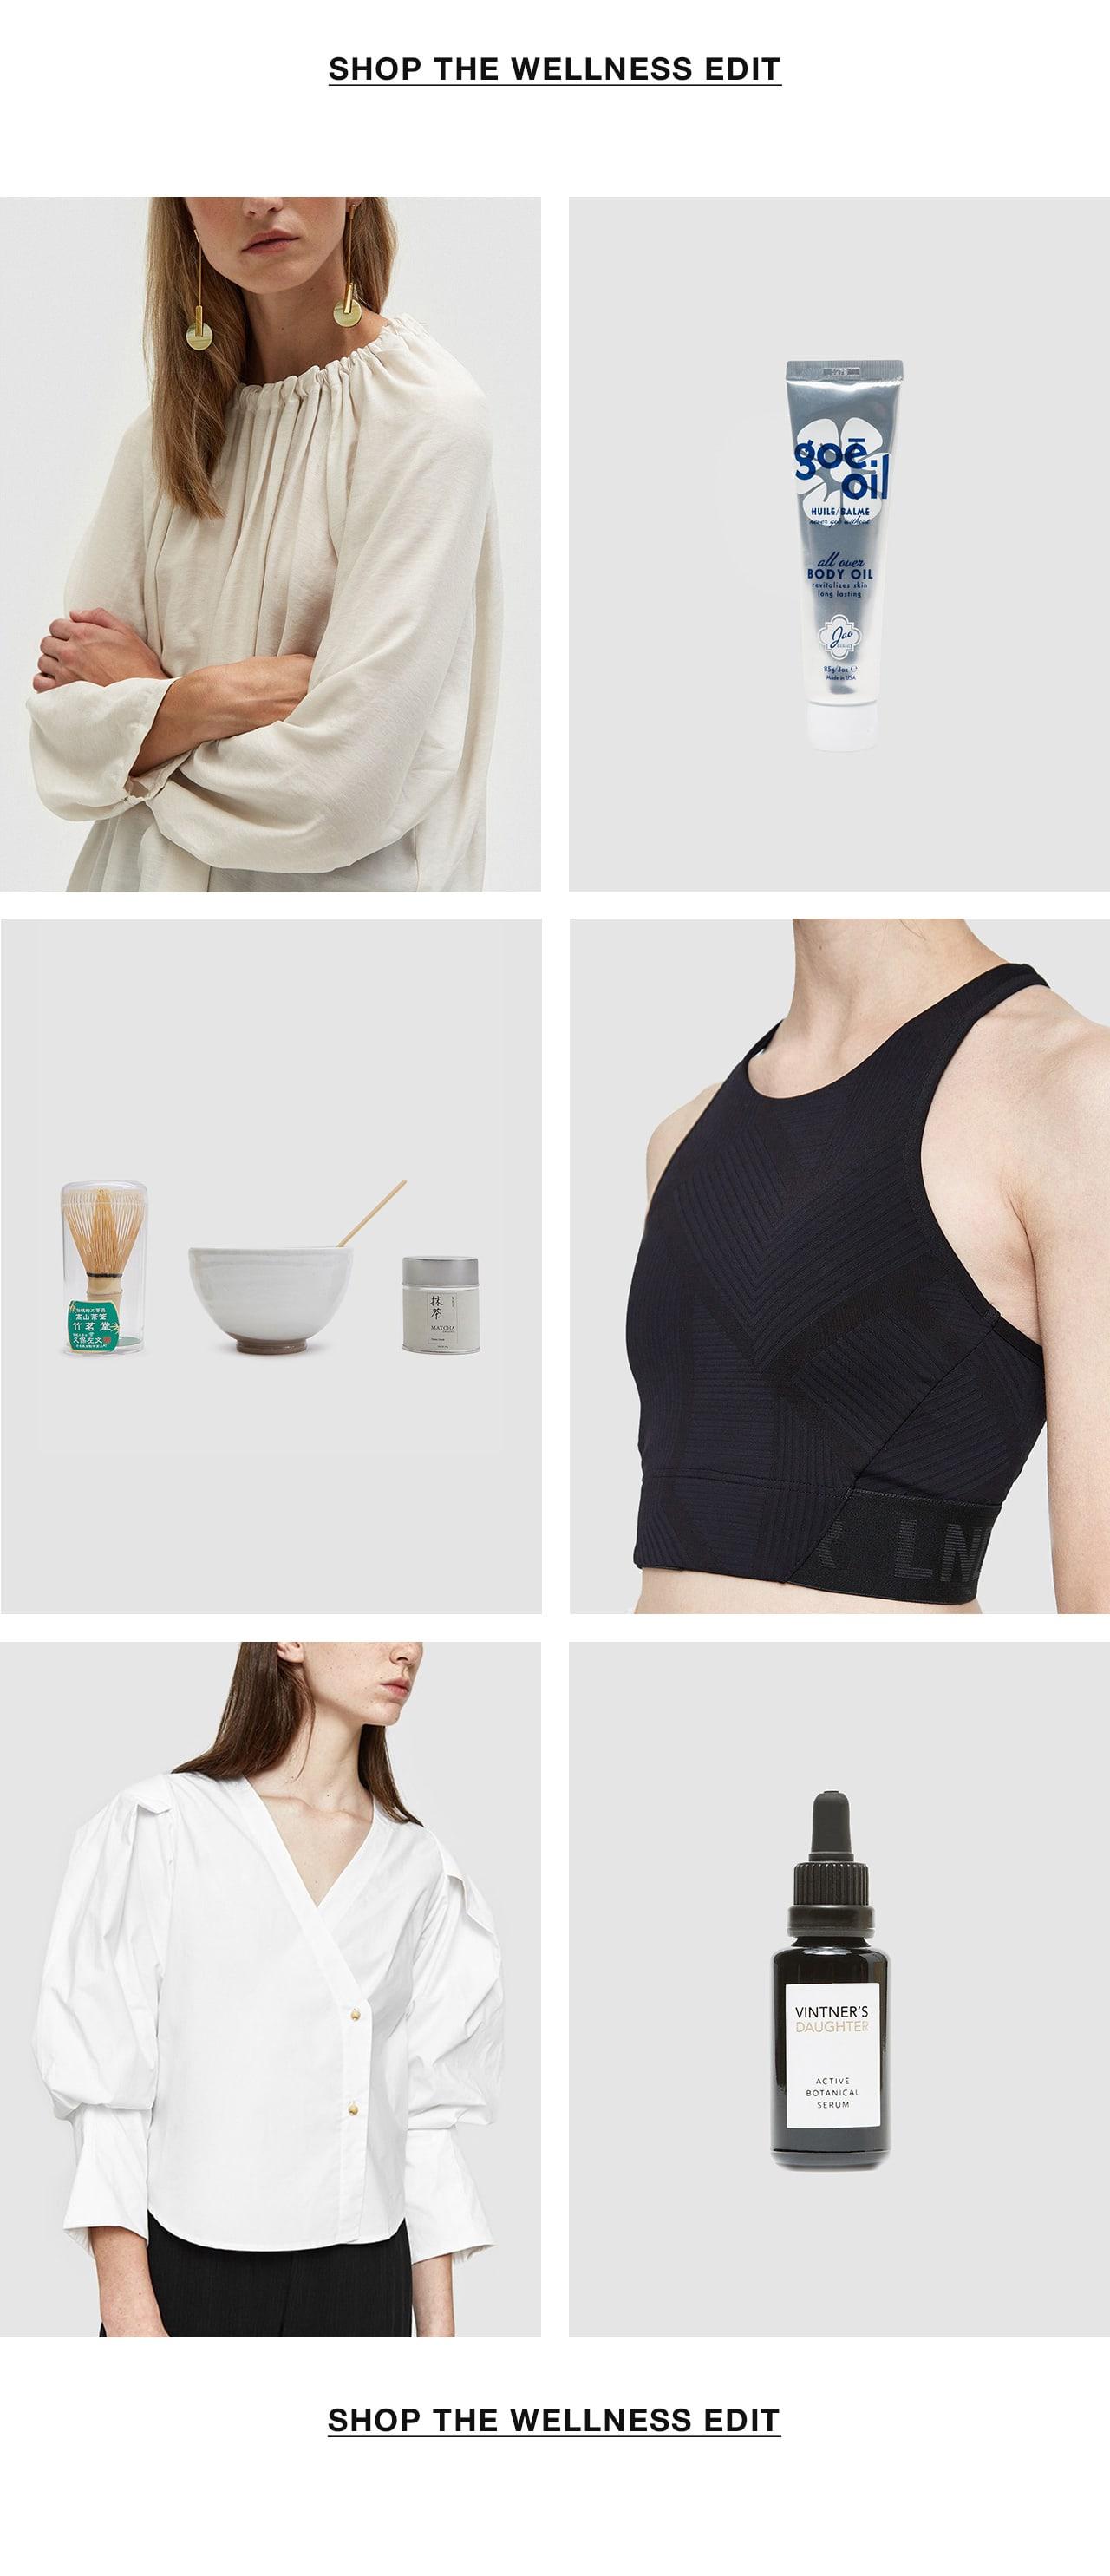 Shop The Wellness Edit